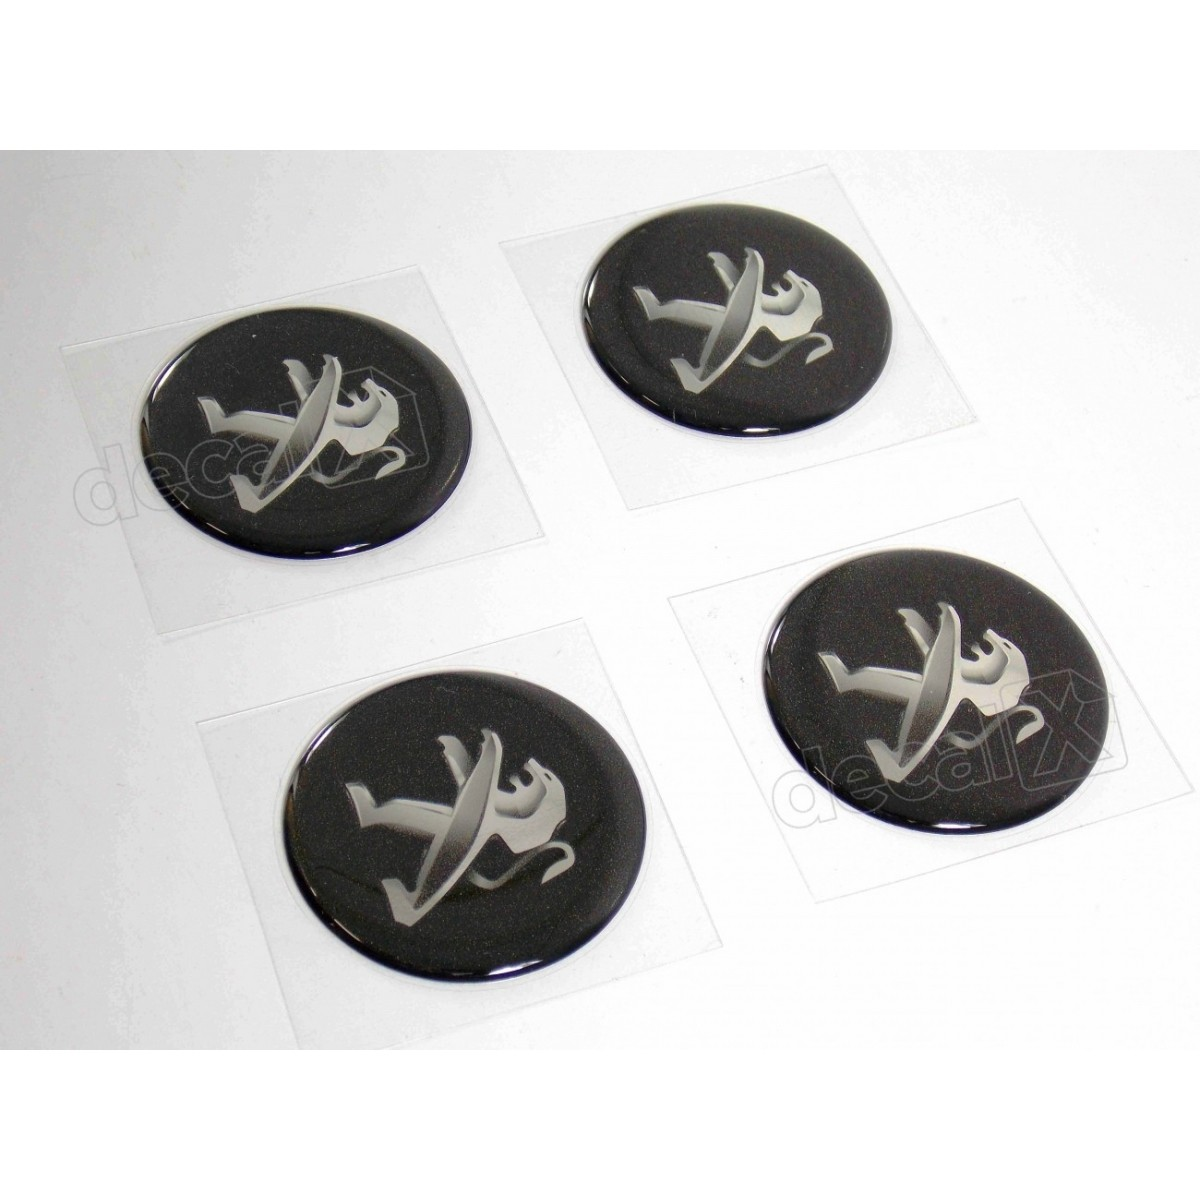 Armario De Parede Pequeno ~ Adesivo Emblema Resinado Roda Peugeot 58mm Cl8 Adesivos para motos& Adesivos automotivos Decalx